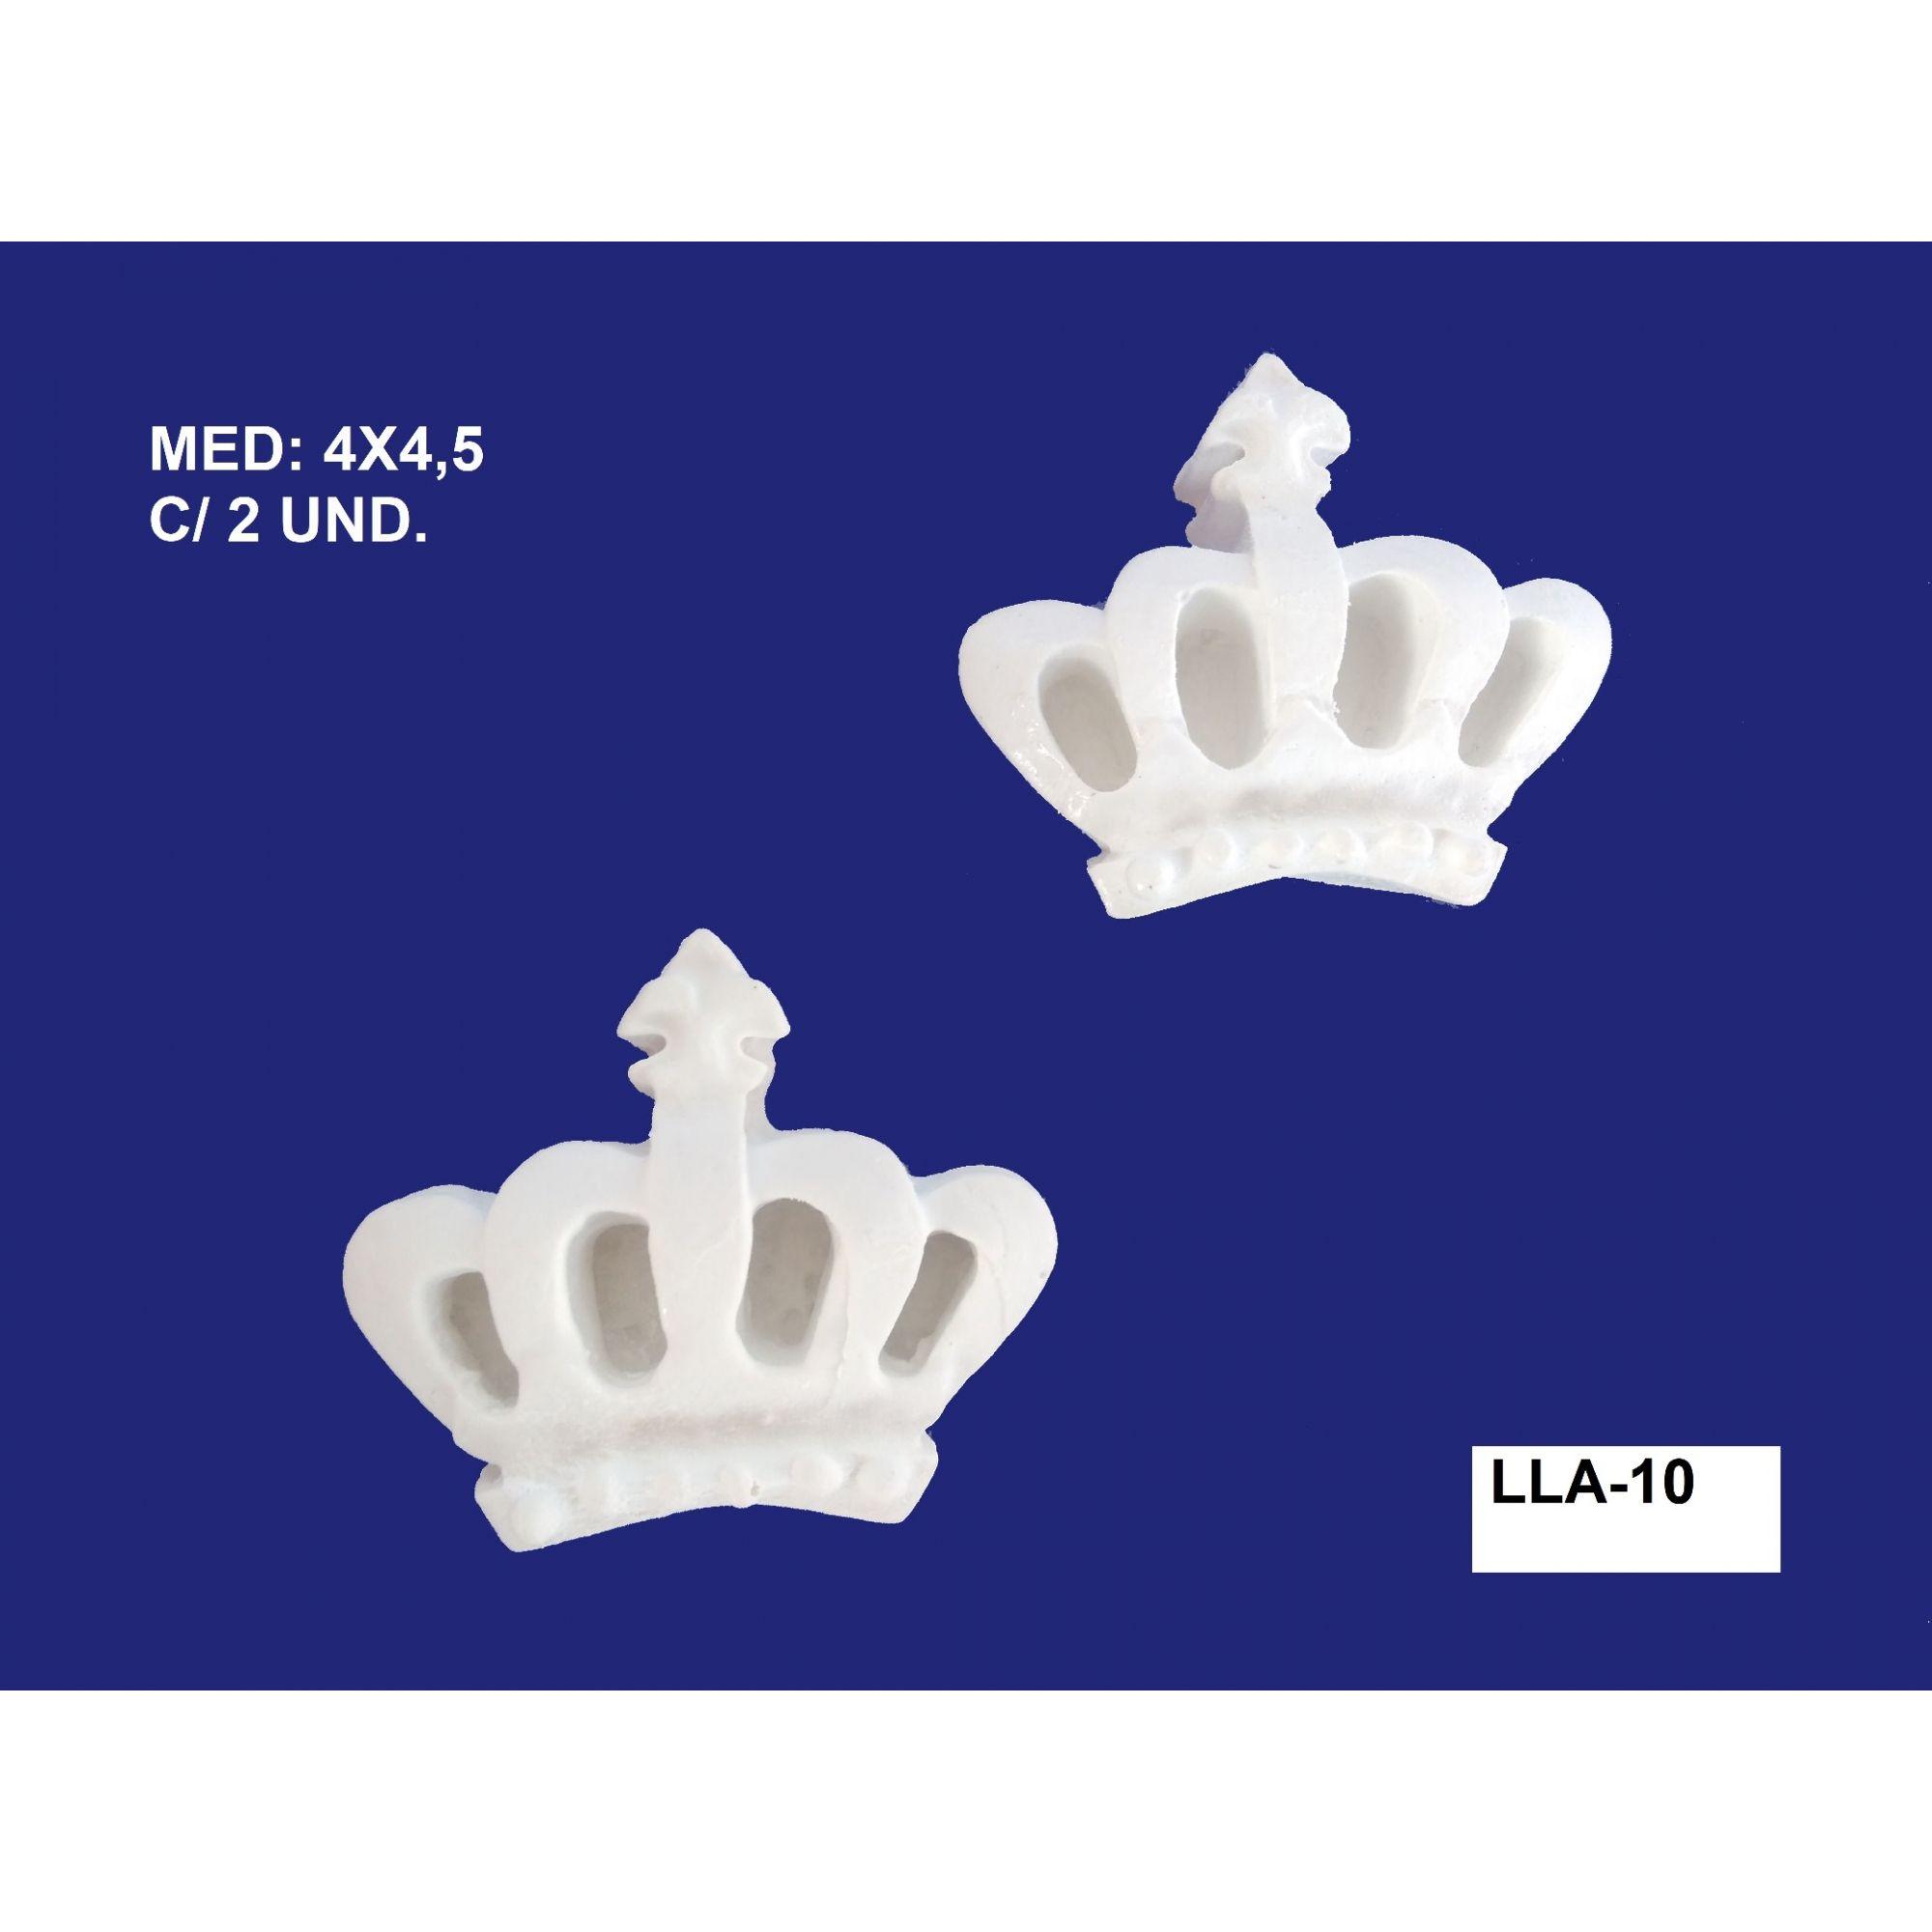 LLA-10 APLIQUE COROA 04x4,5CM C/ 2 UND.